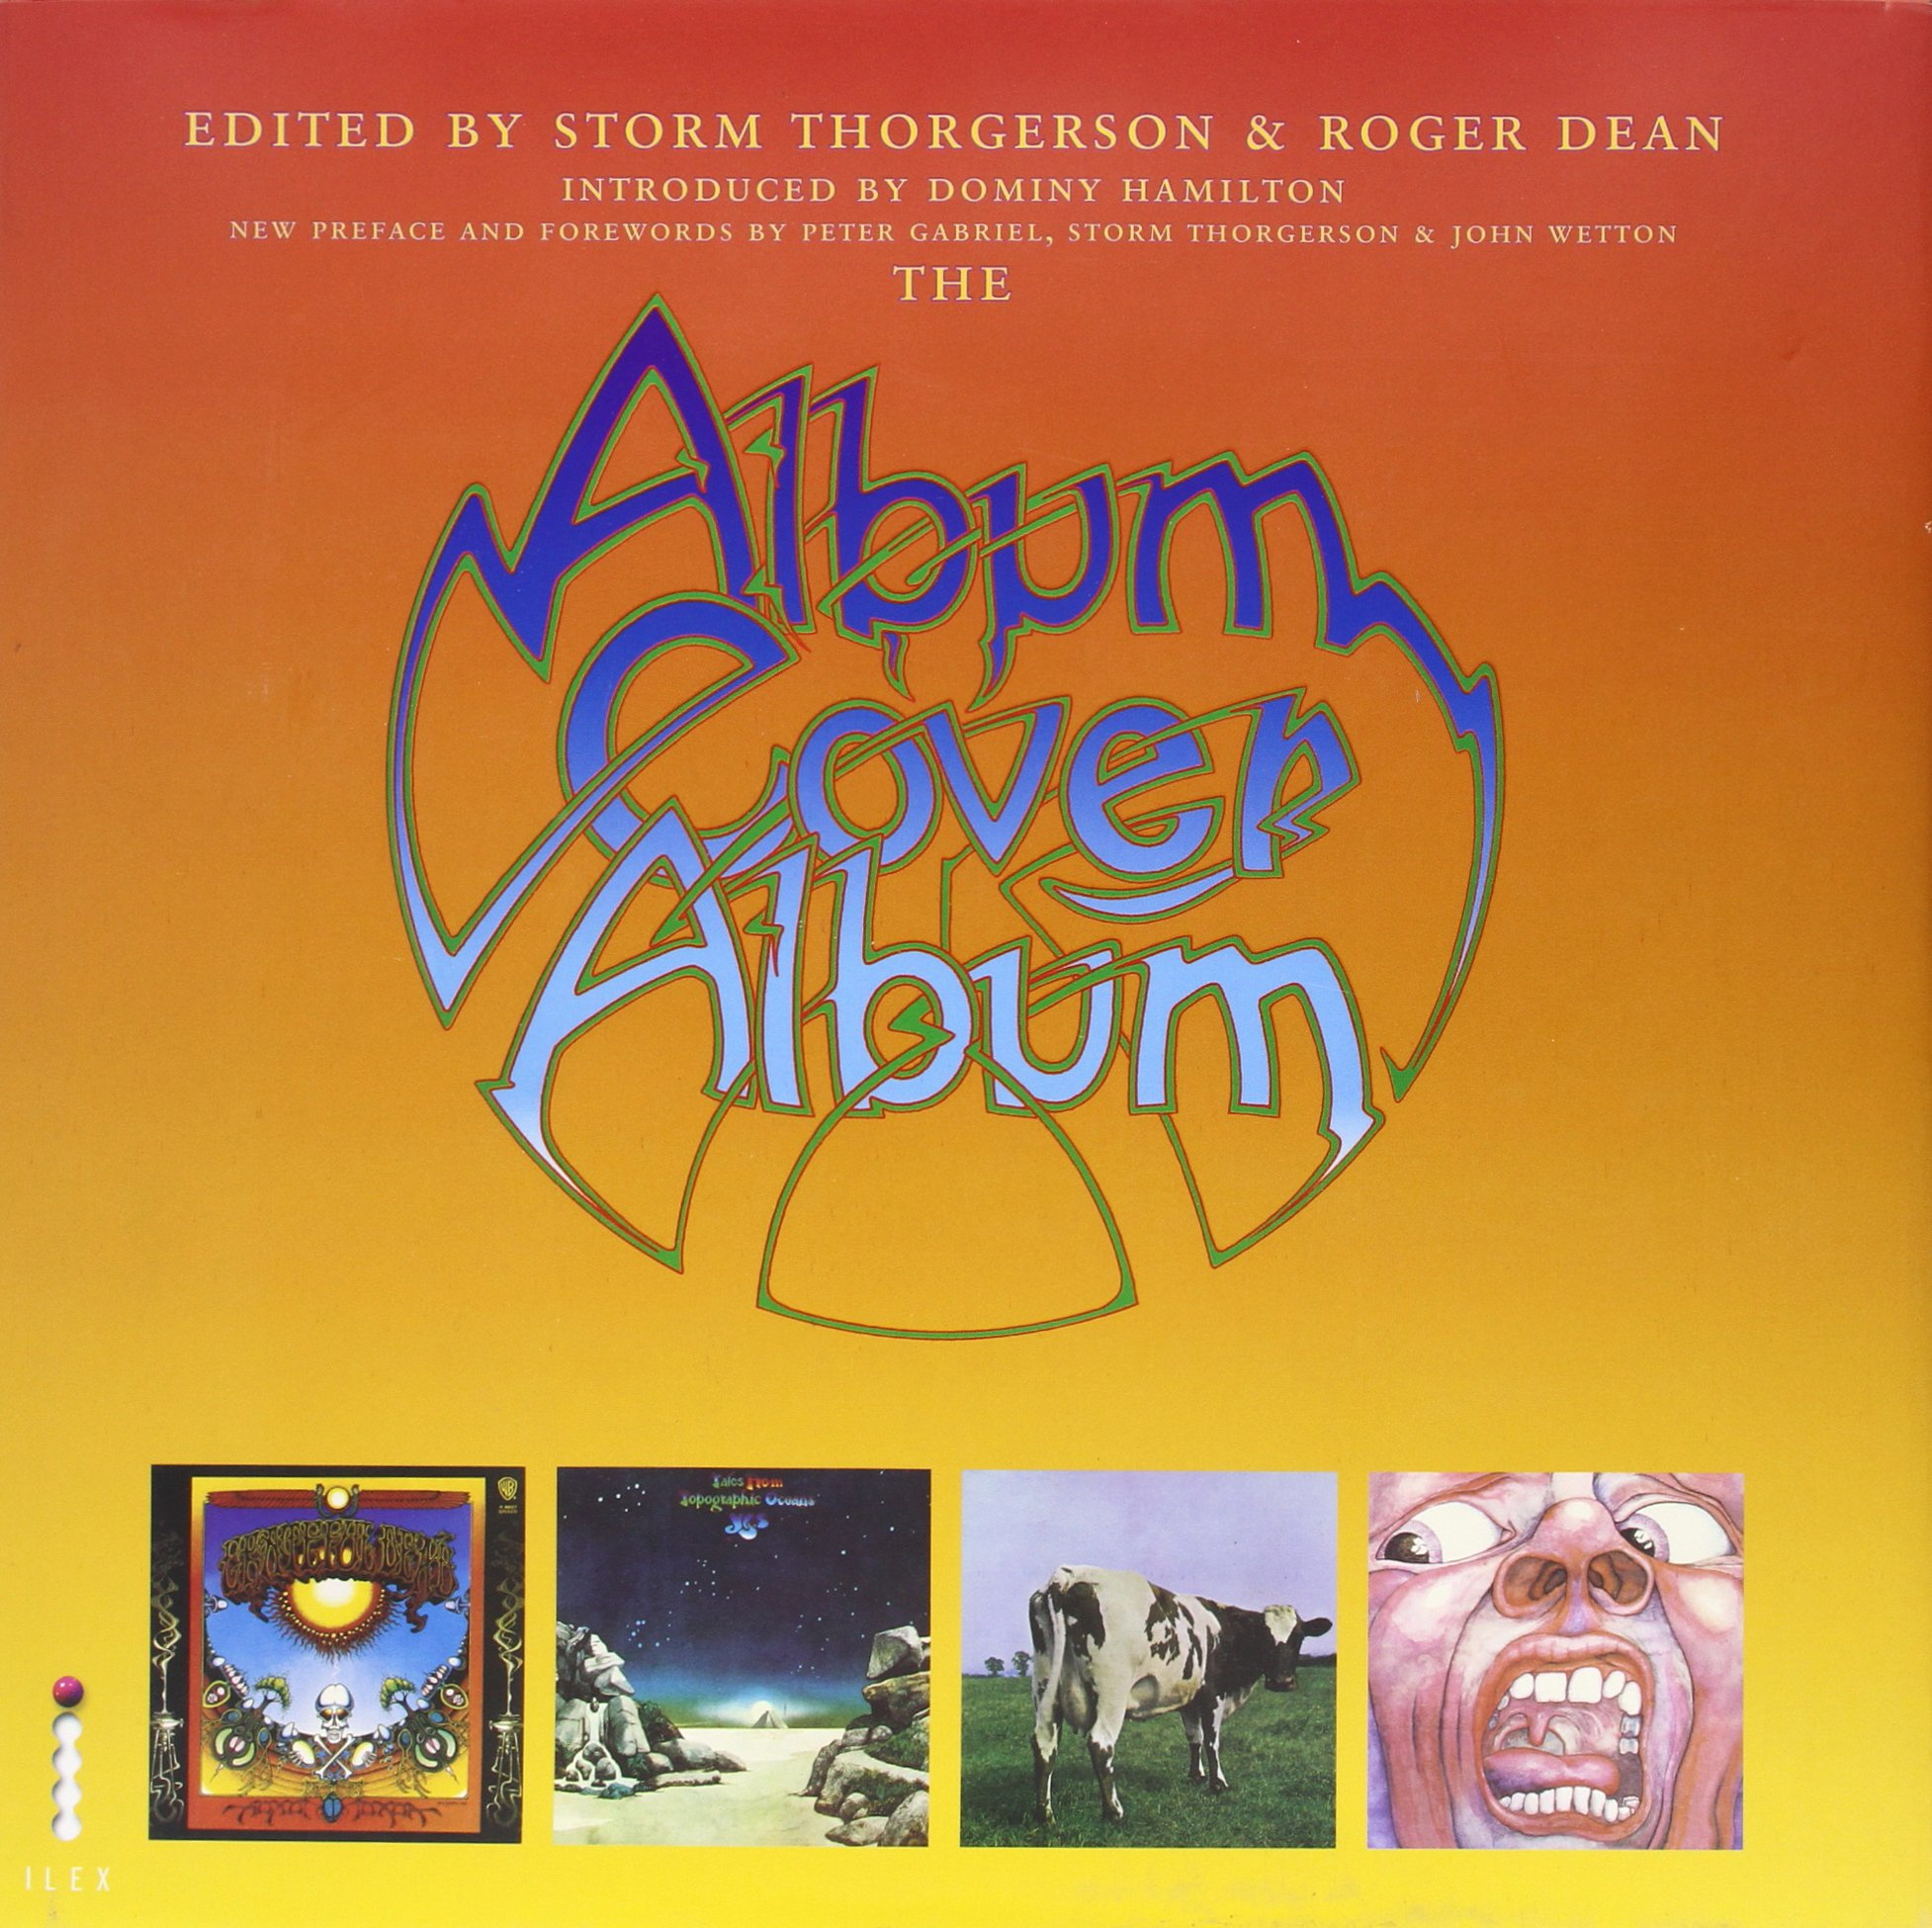 Roger Dean: The Album Cover Album: Amazon.co.uk: Roger Dean, Dominy Hamilton: 9781905814404: Books